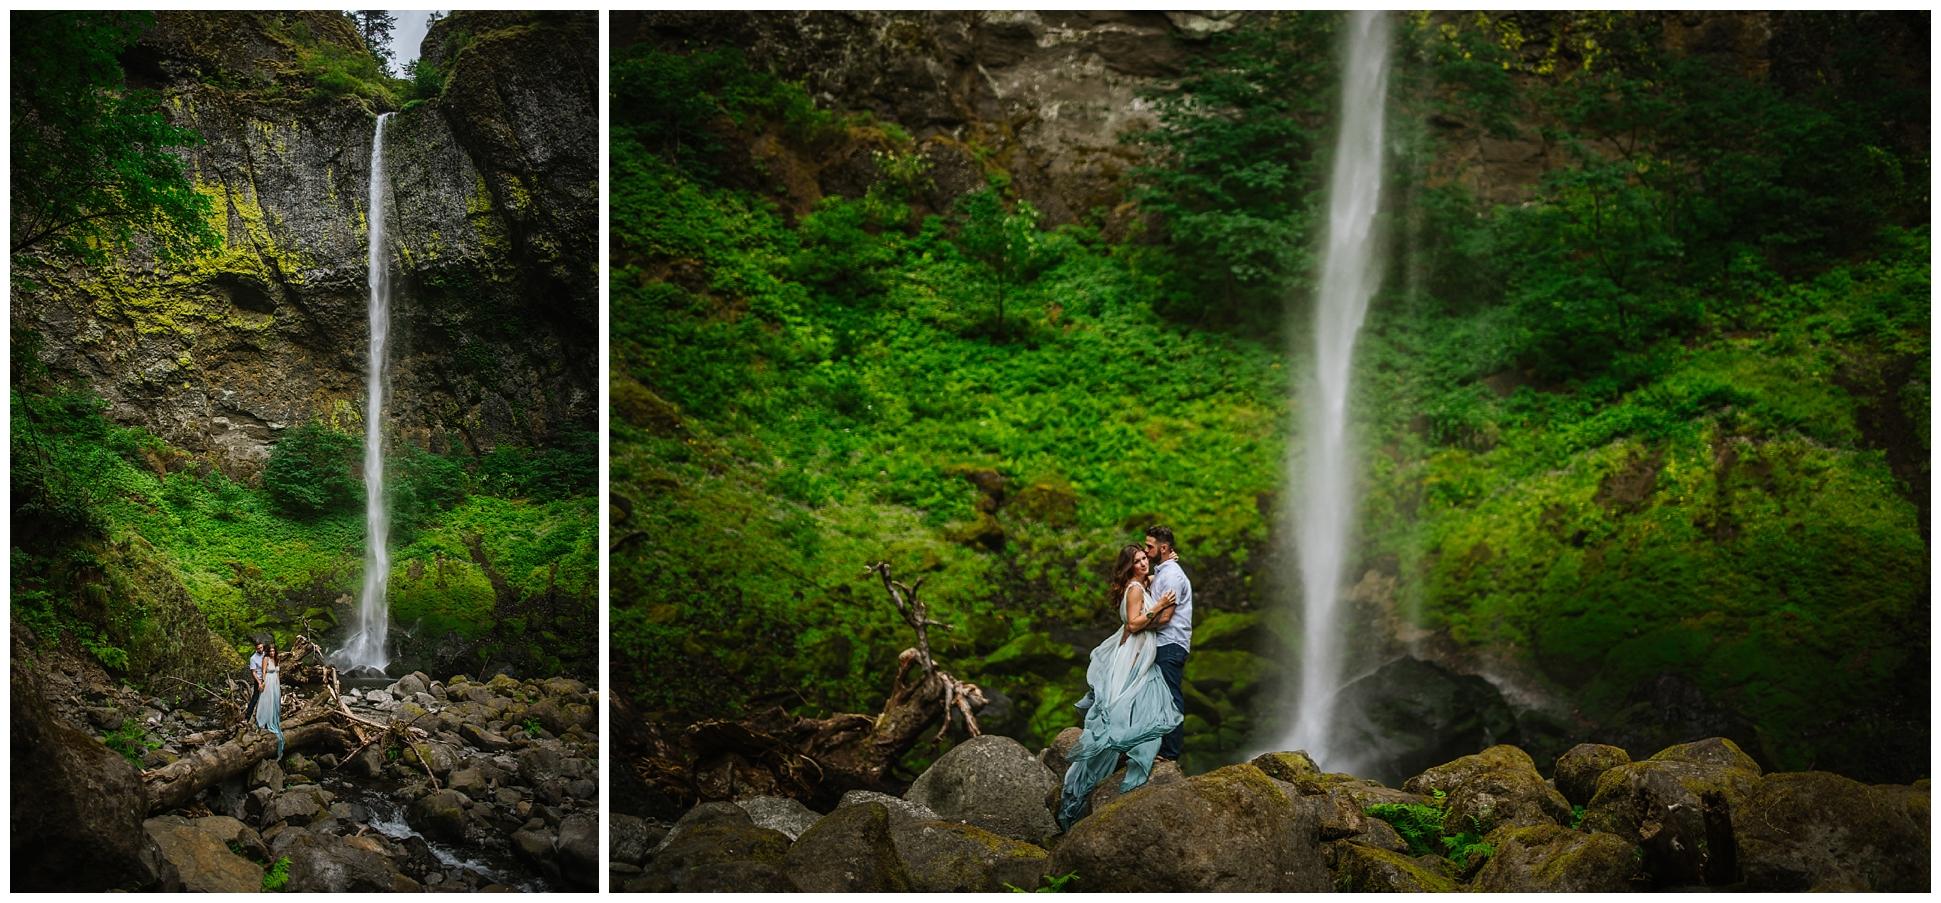 Ashlee-hamon-photography-year-in-review-2016-travel-wanderlust-vsco-adventure-wedding_0040.jpg